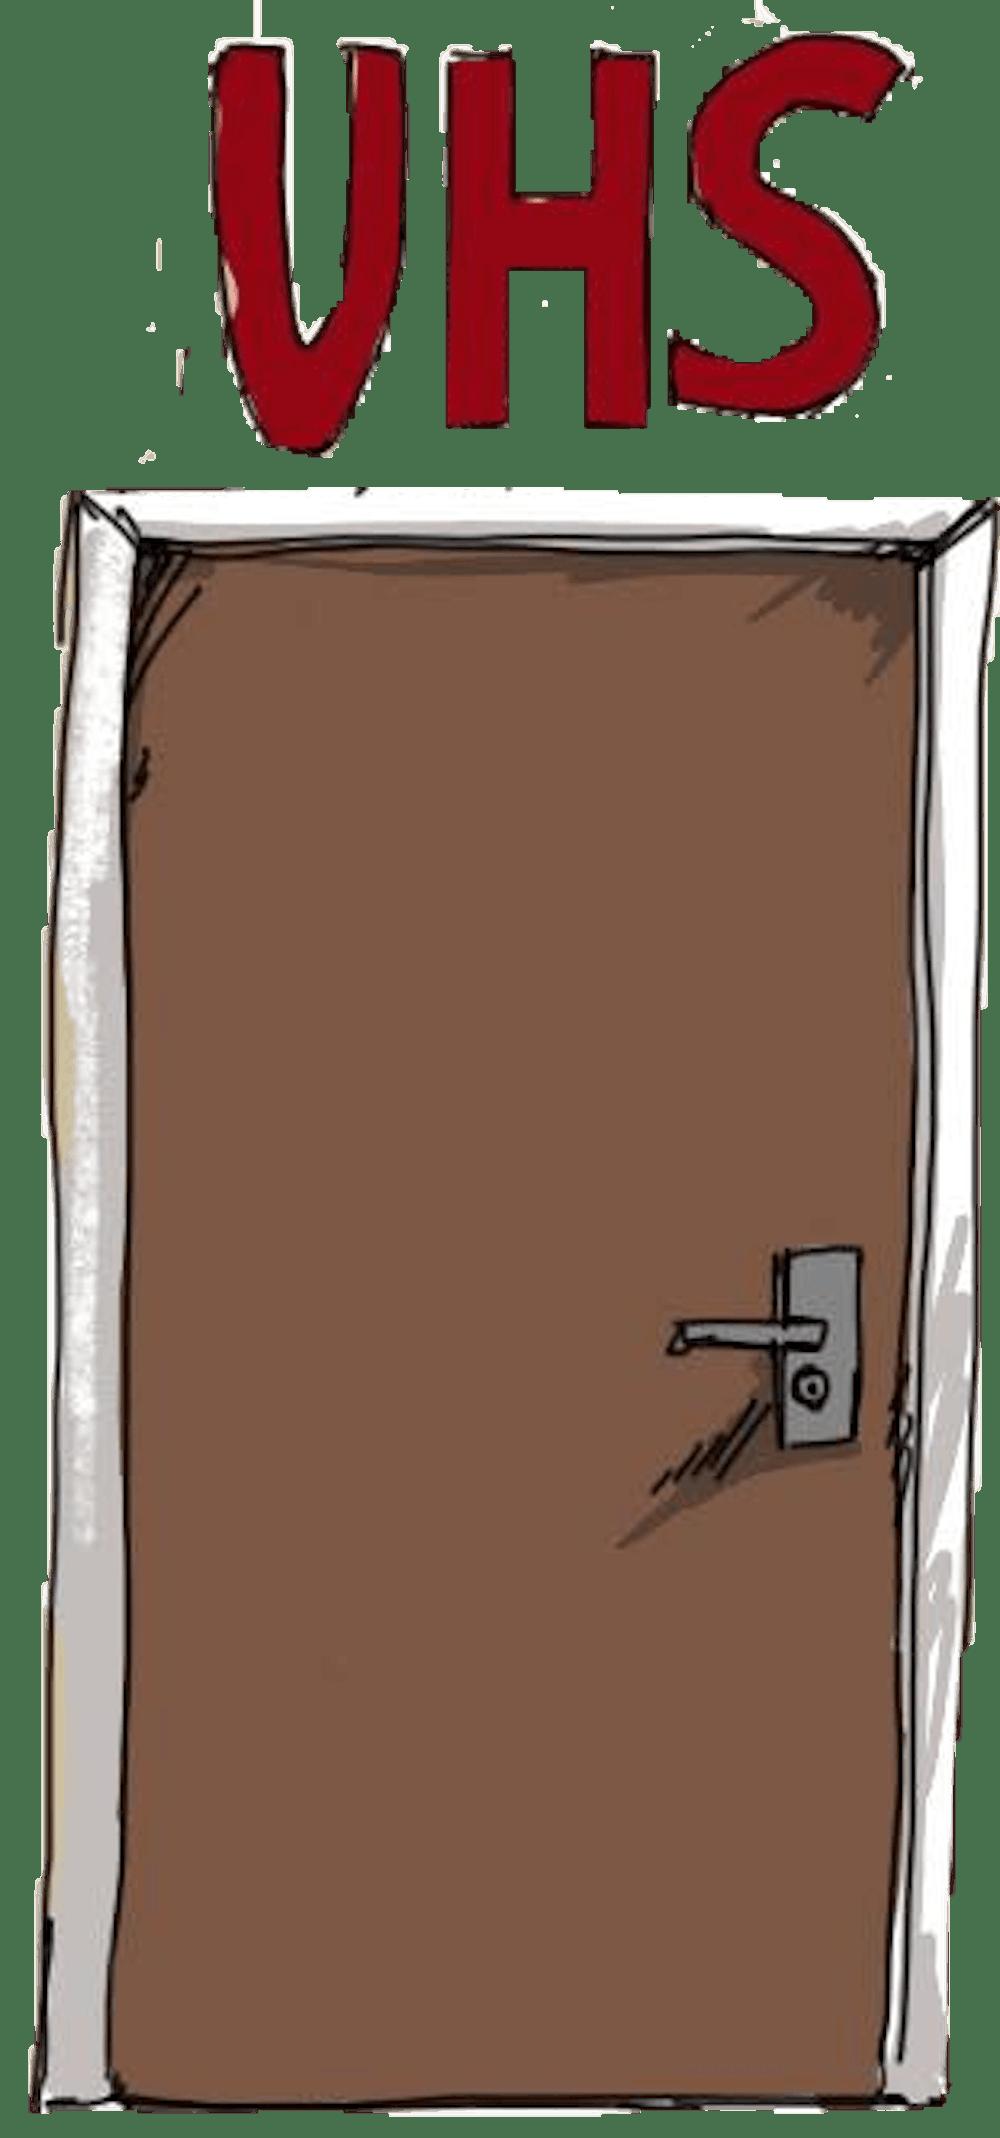 feature_doortry.png